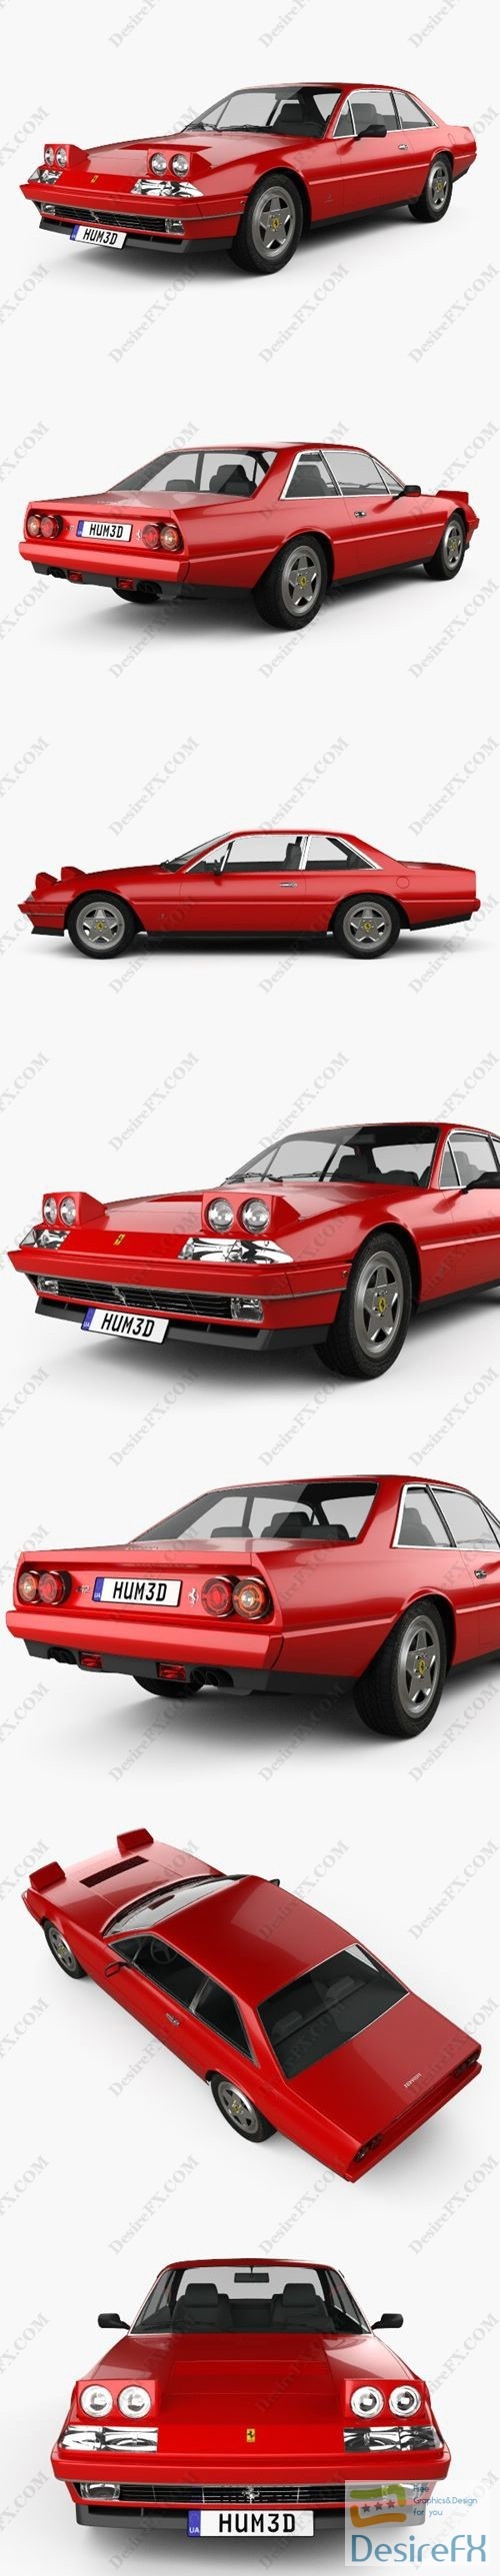 Ferrari 412 1985 3D Model